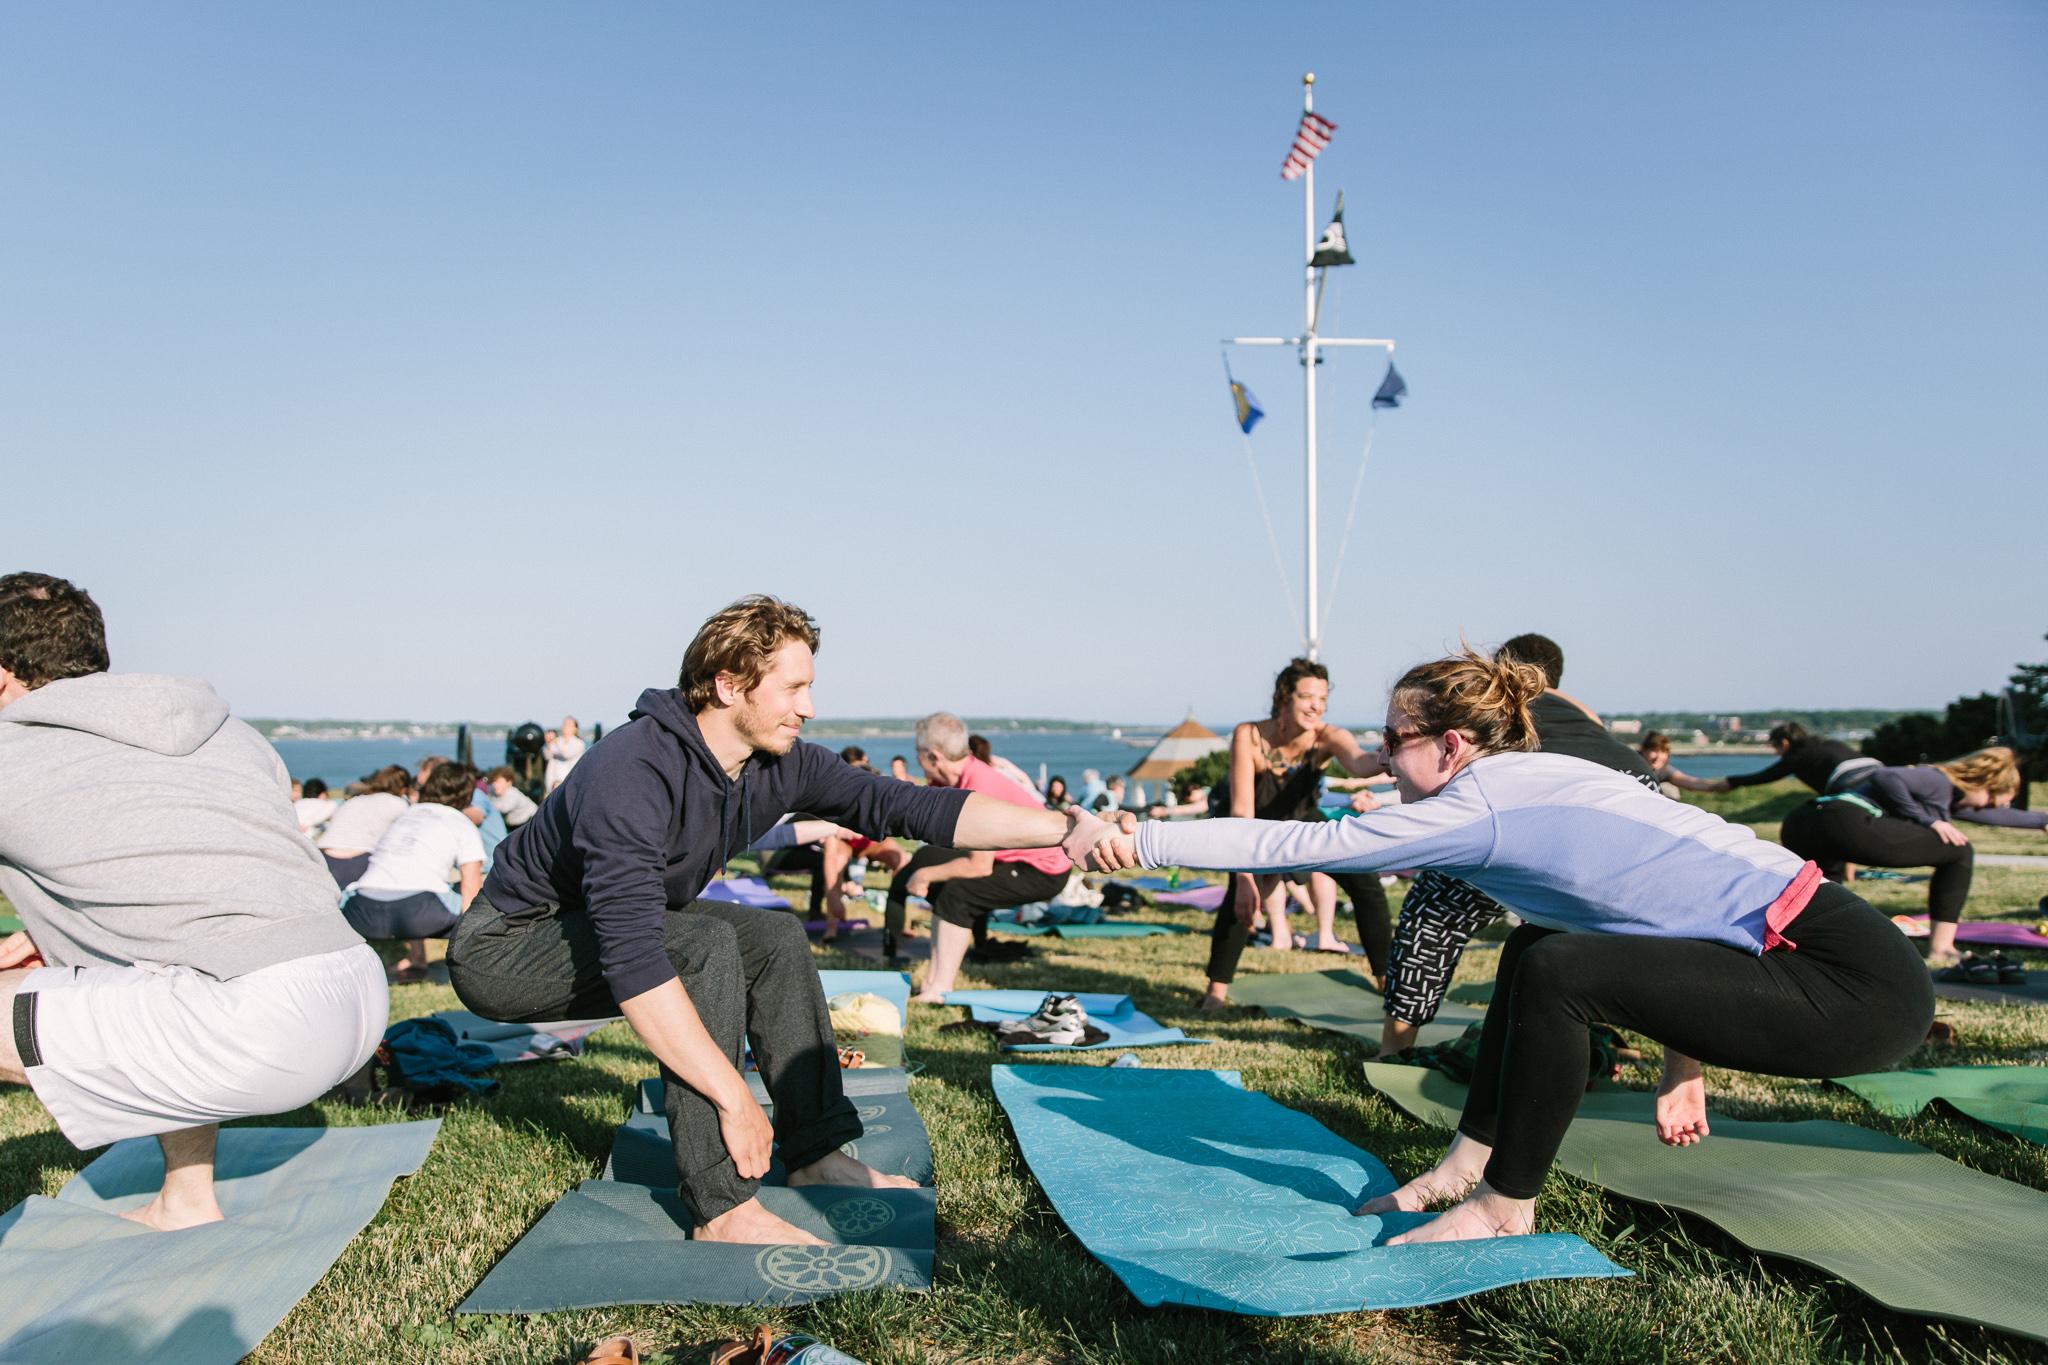 Over 70 people attended the recent Summer Solstice celebration at Fort Allen Park.  Photos: Courtney Elizabeth